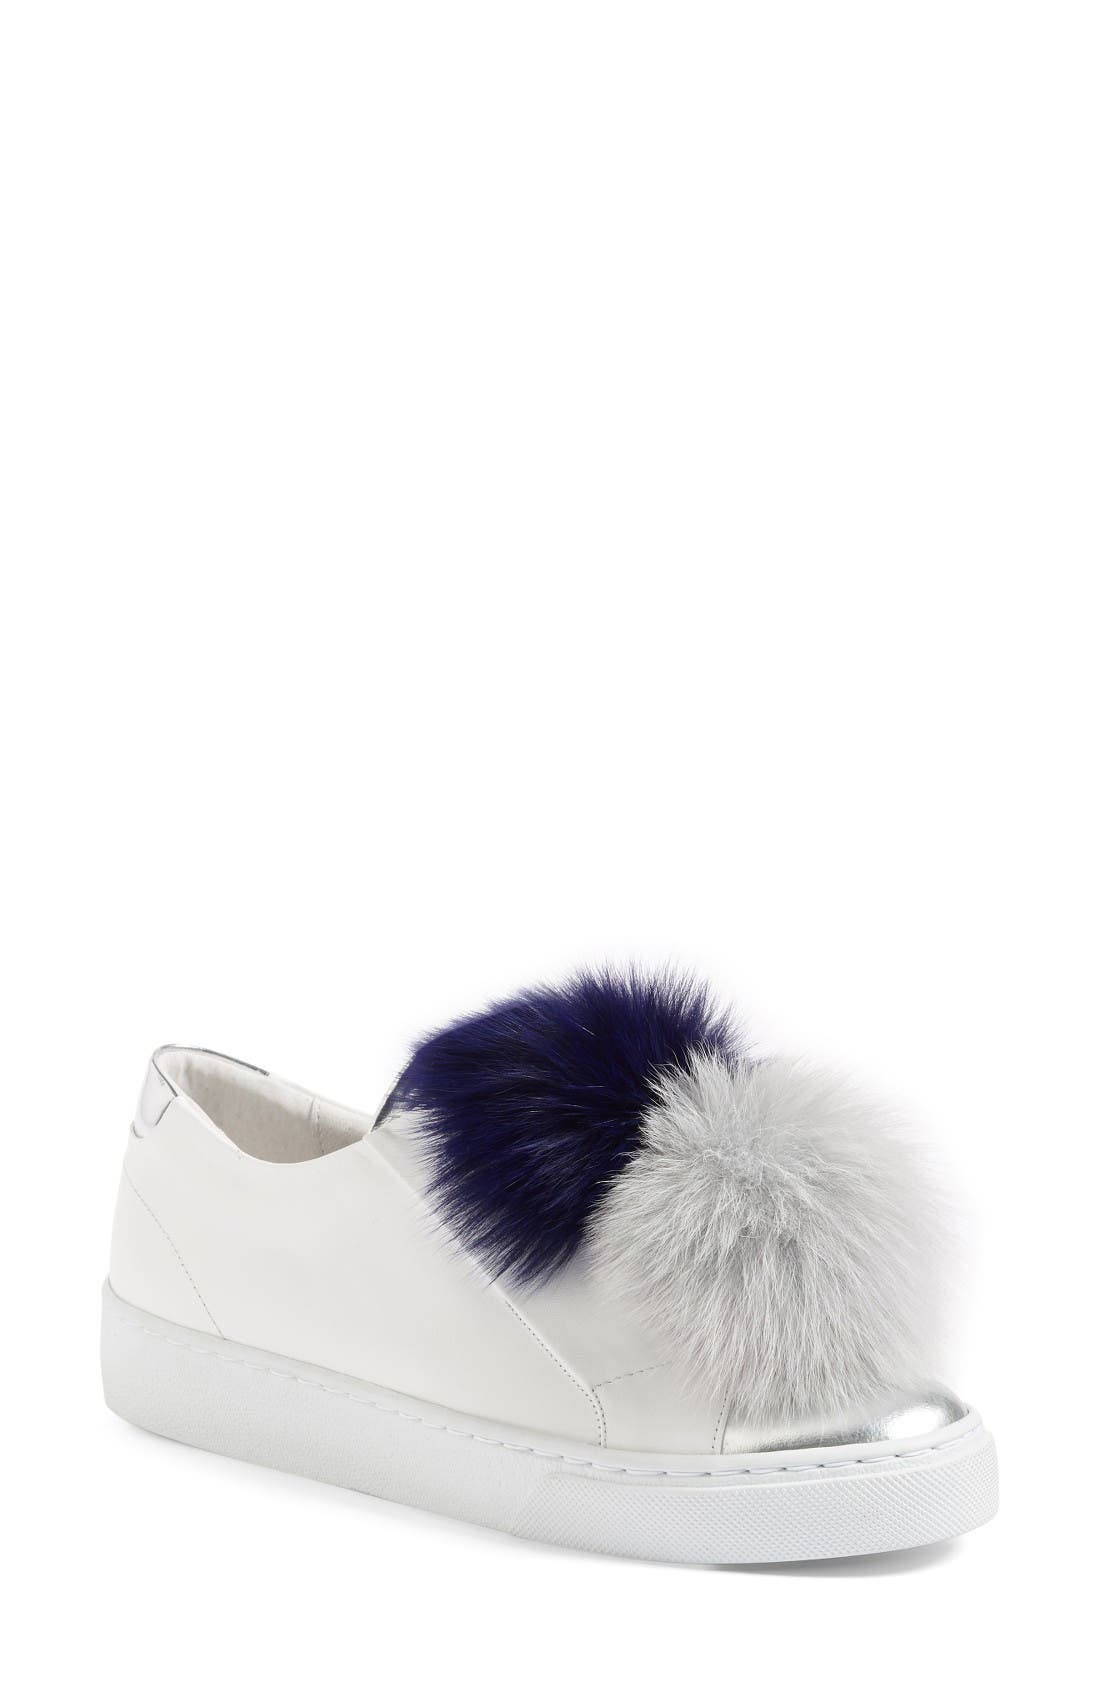 Arian Genuine Fox Fur Trim Sneaker,                         Main,                         color, White Leather/ Navy/ Grey